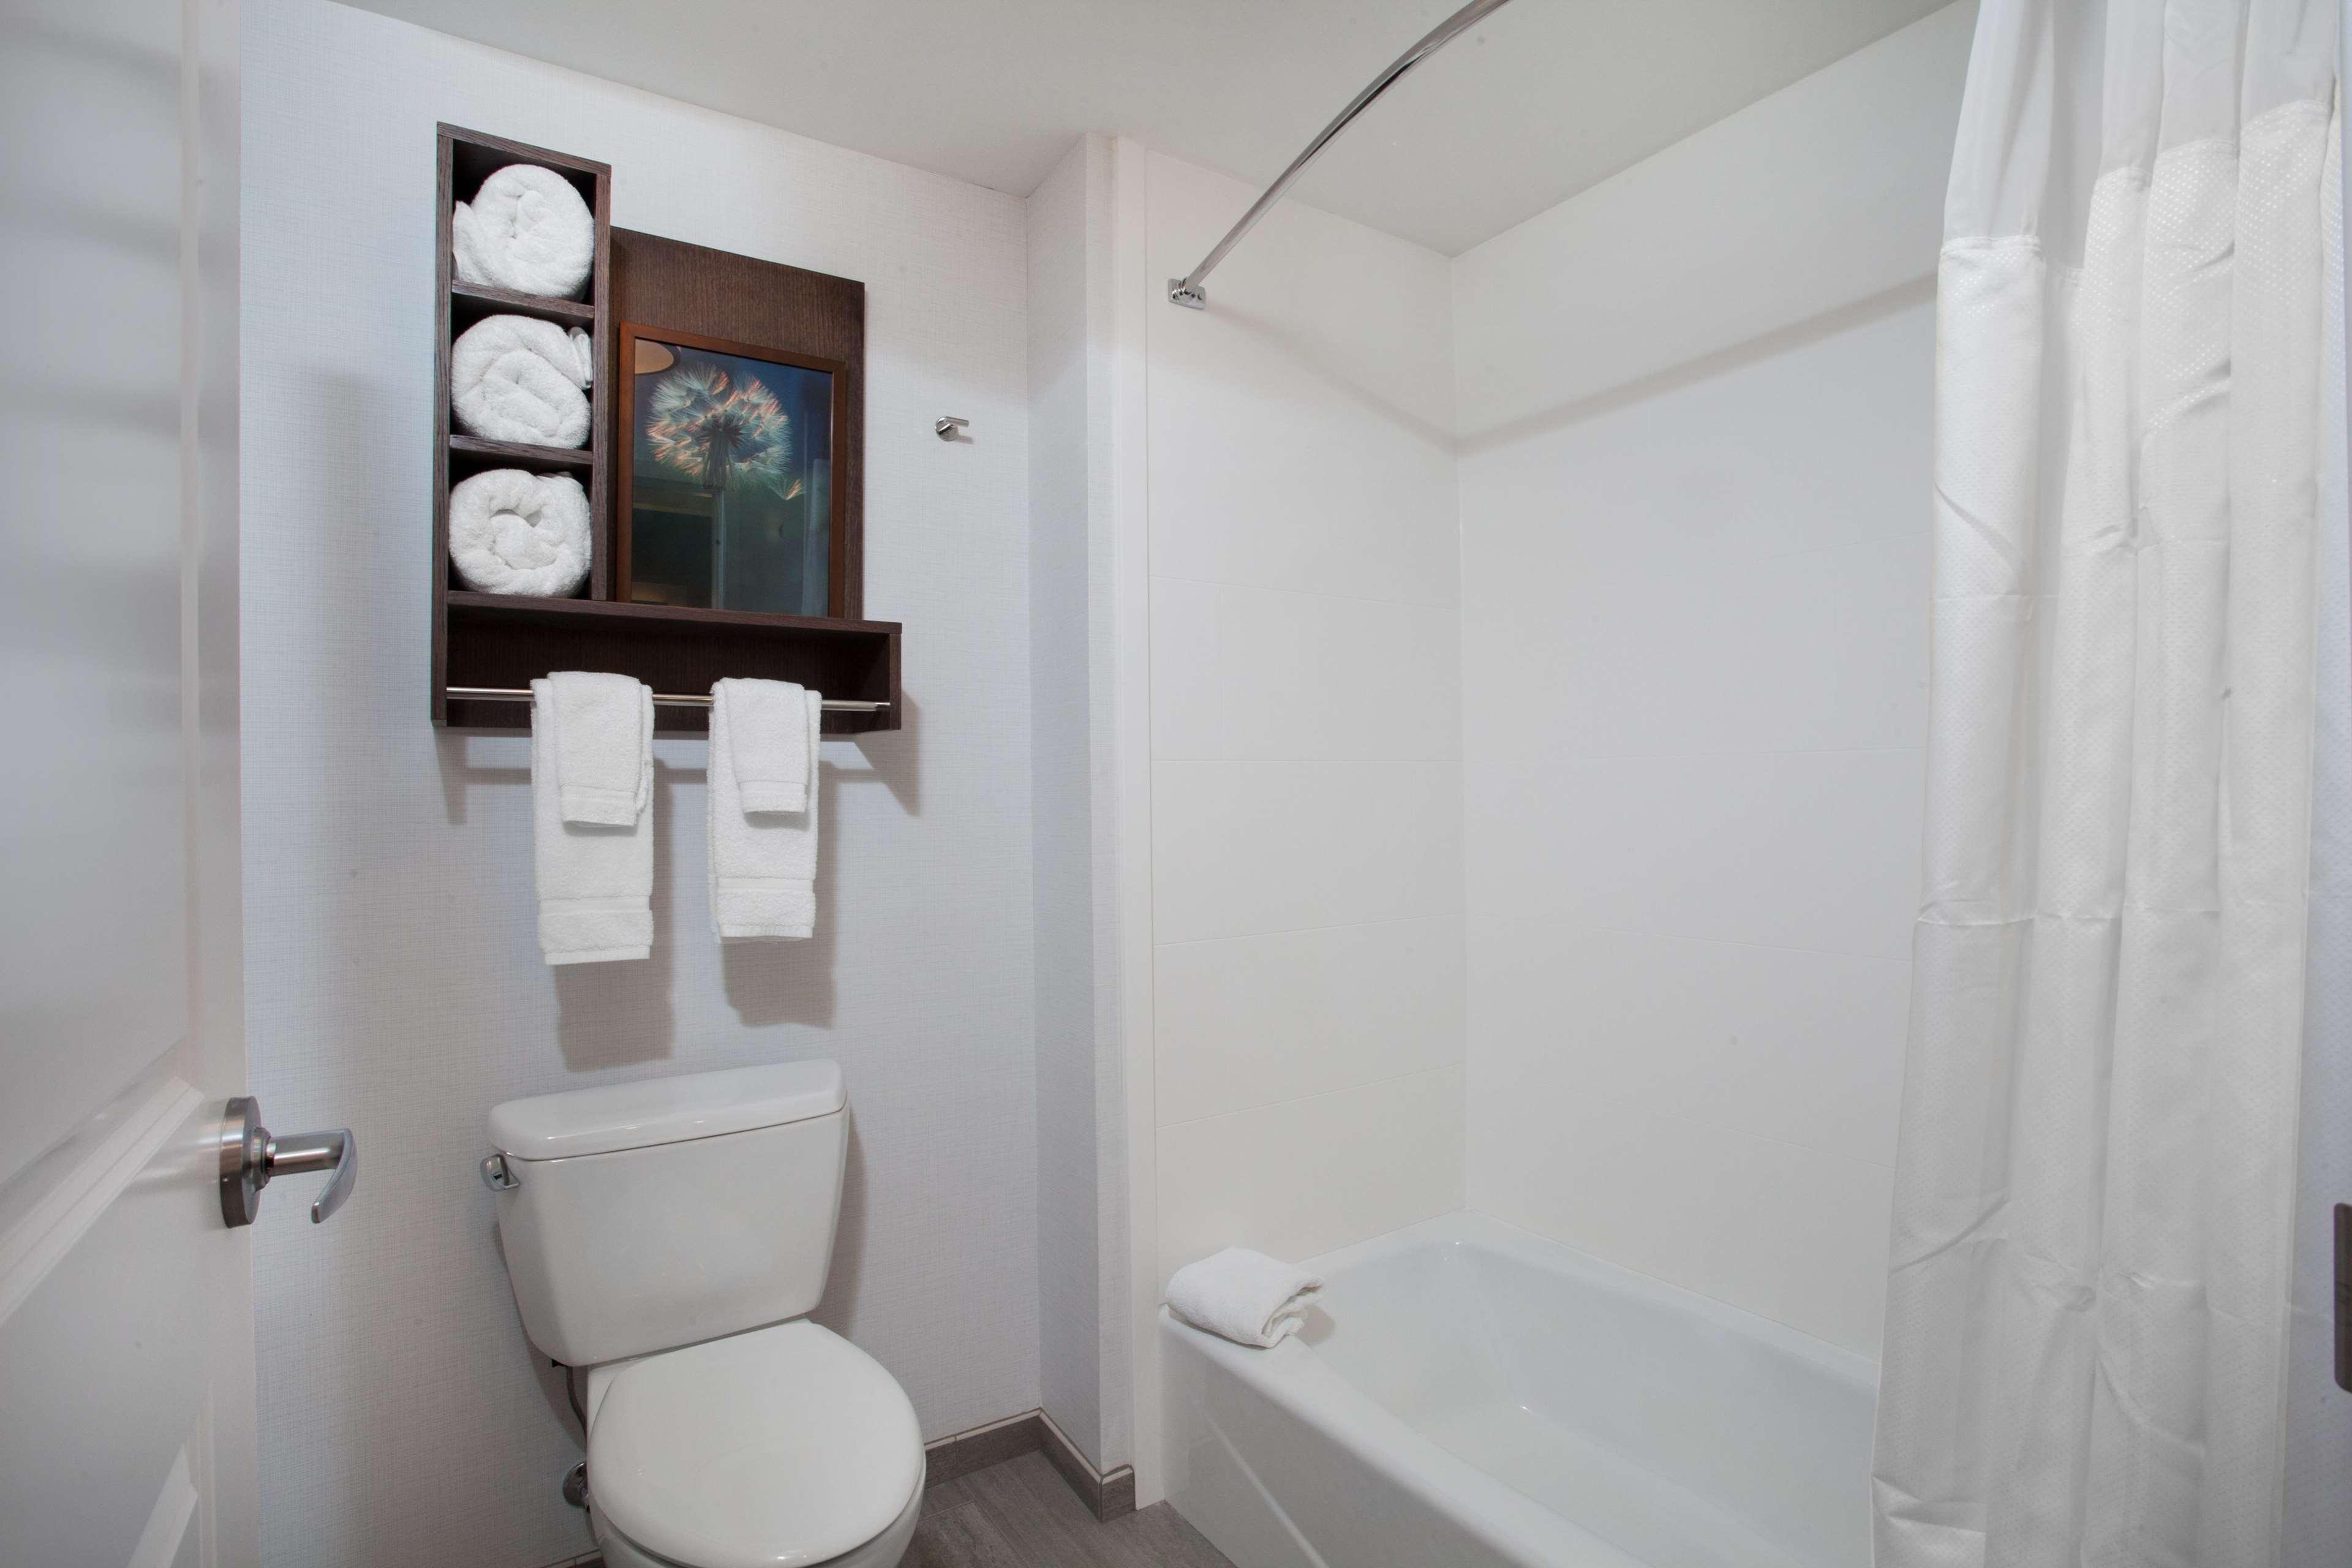 Homewood Suites by Hilton Saratoga Springs image 40